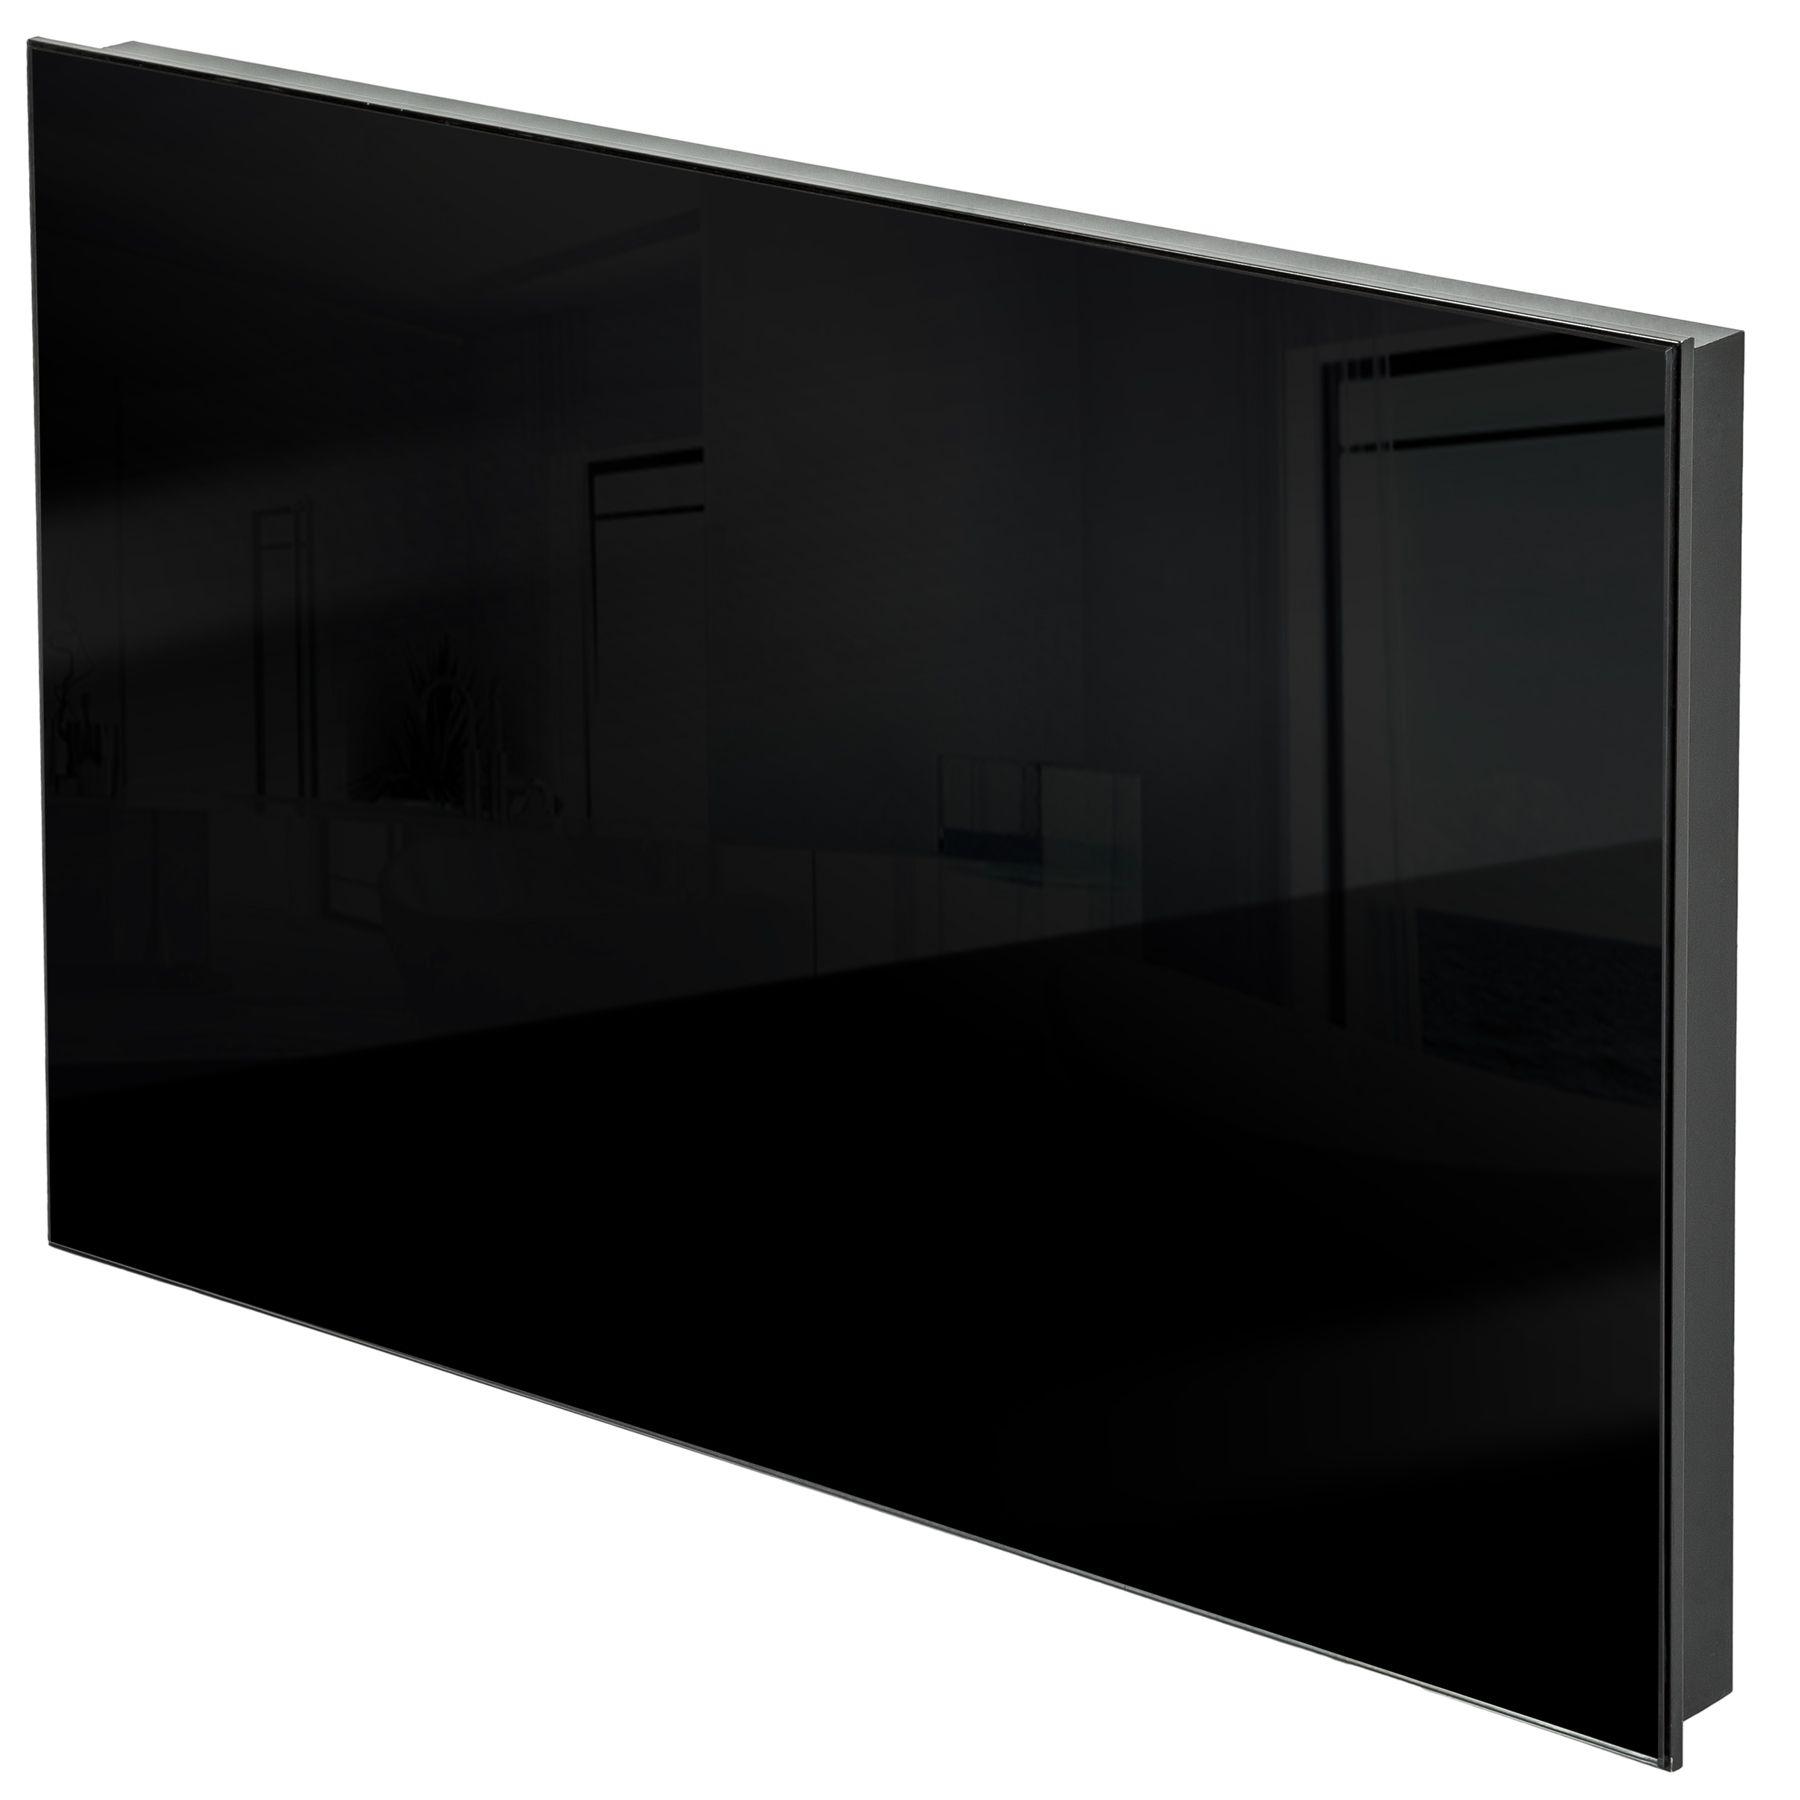 chauffage infrarouge en verre electrique 270 watt radiant radiateur ip44 noir ebay. Black Bedroom Furniture Sets. Home Design Ideas